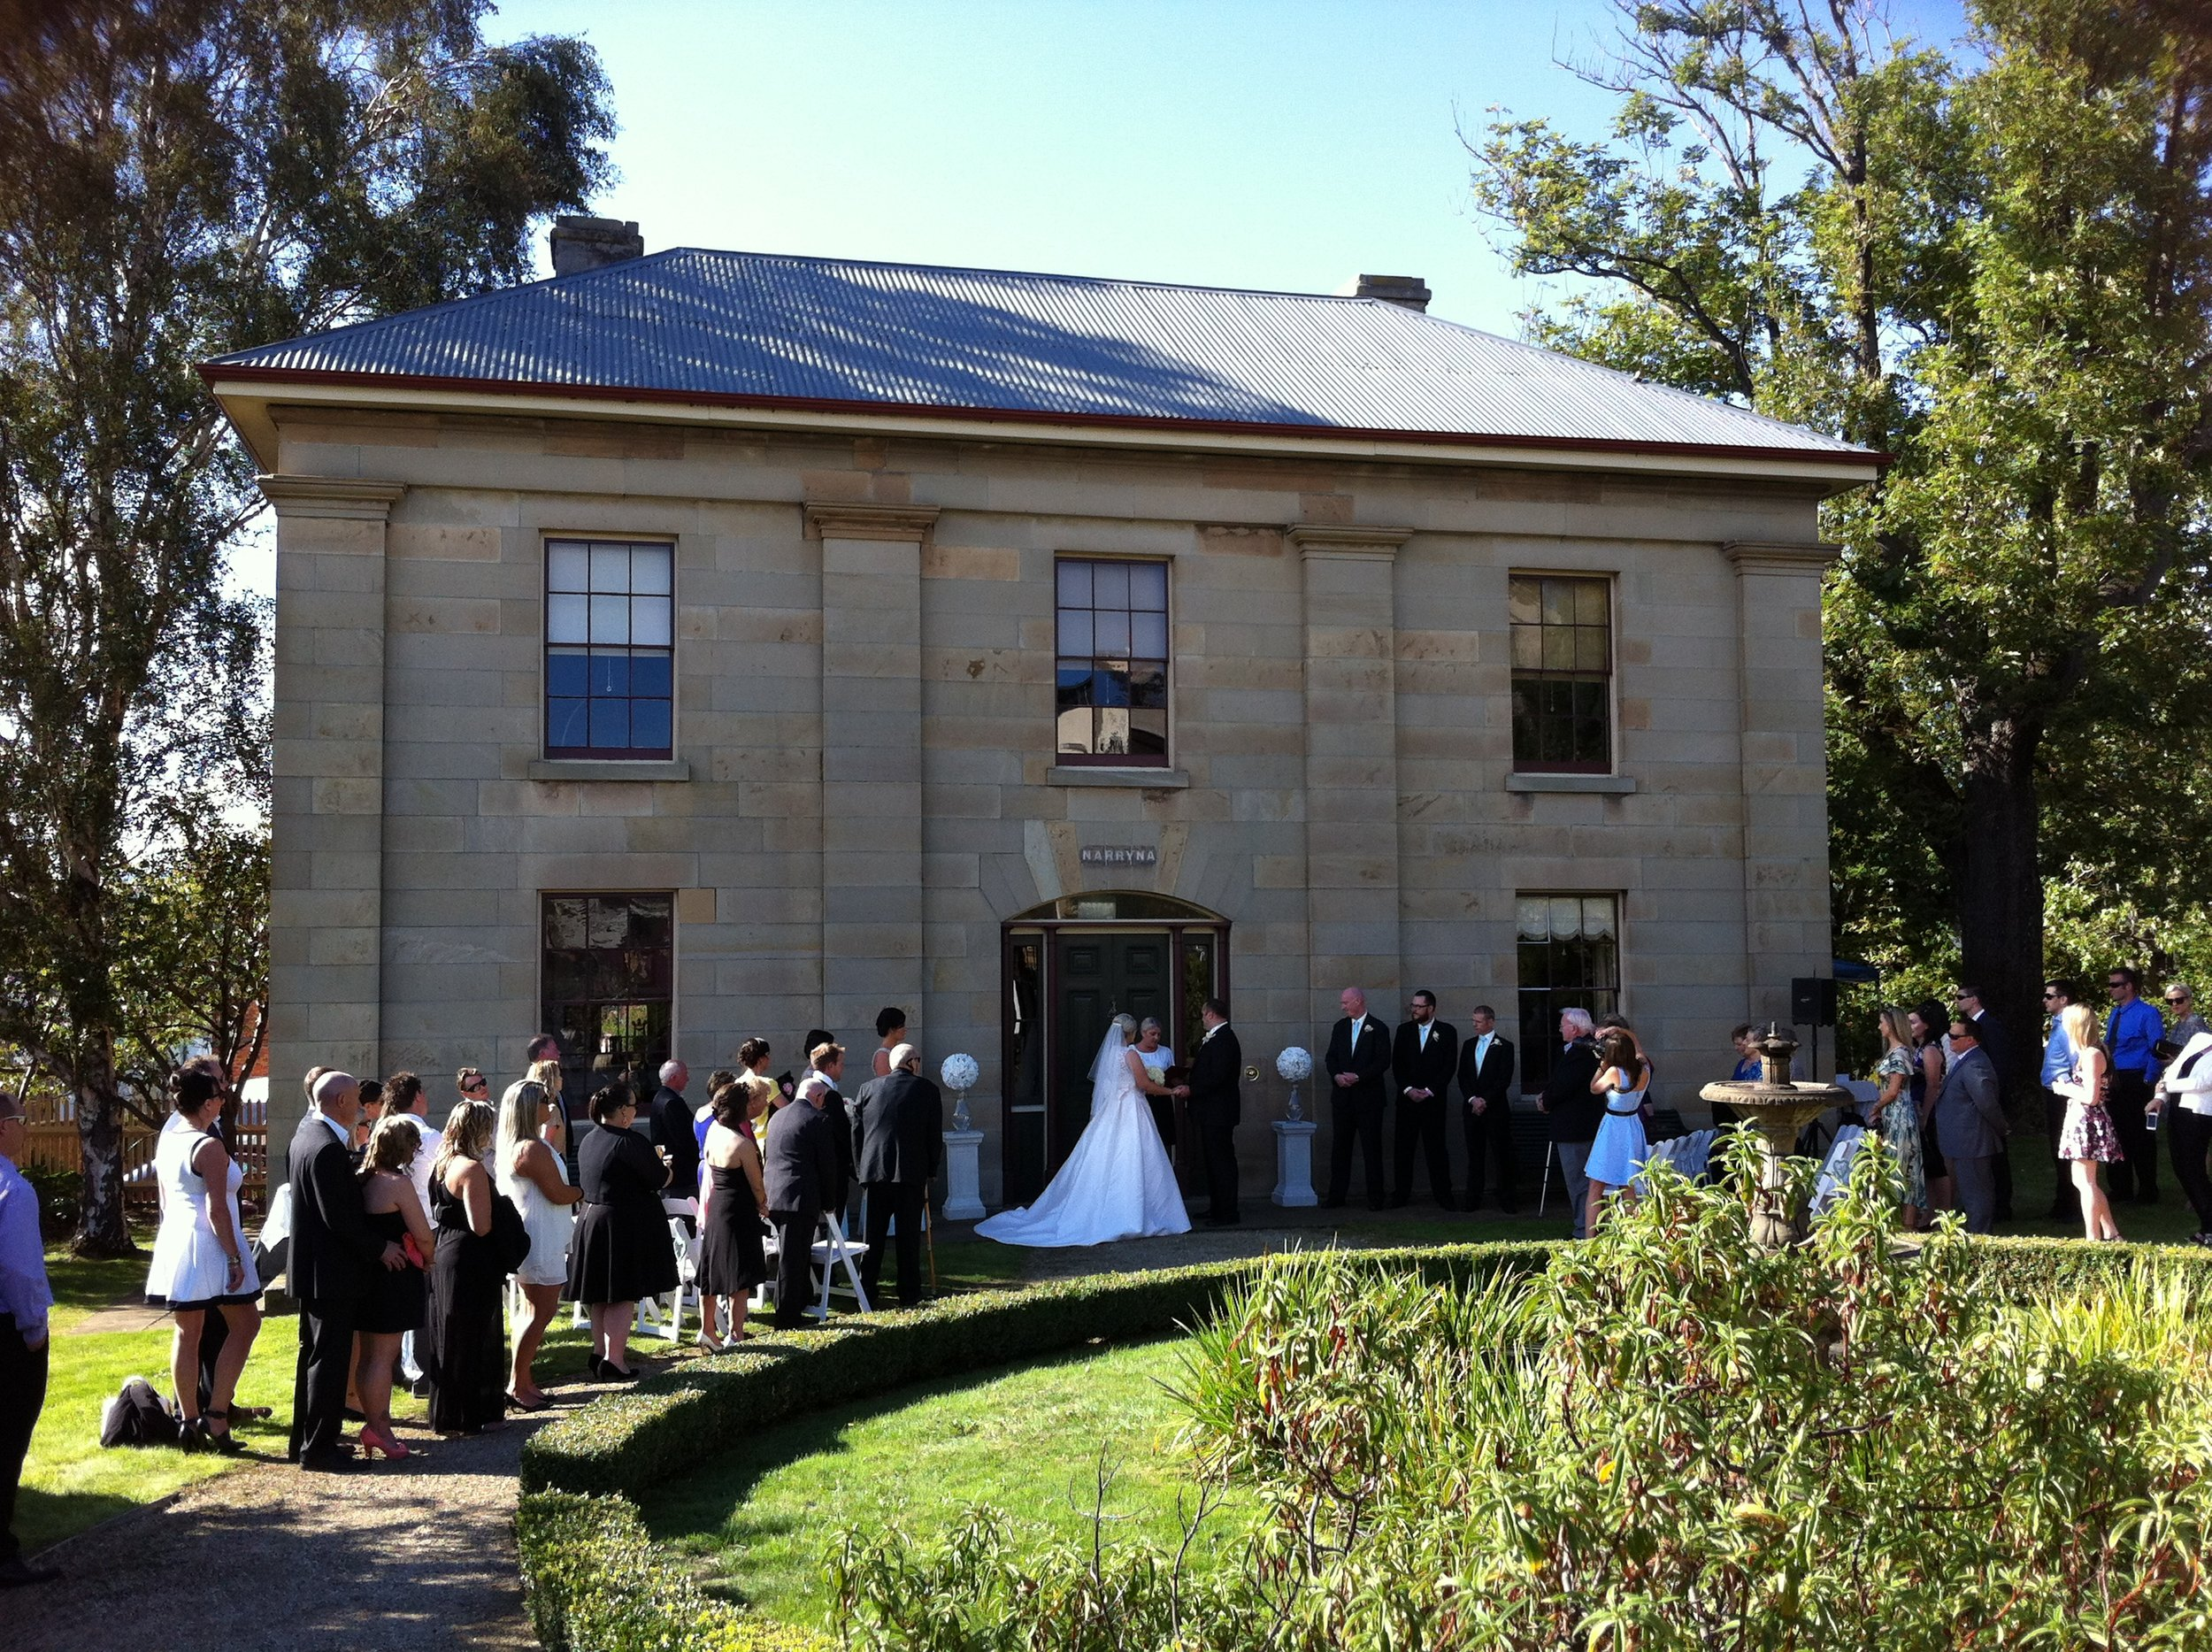 Butler-Lefebre wedding March 2014 17.JPG